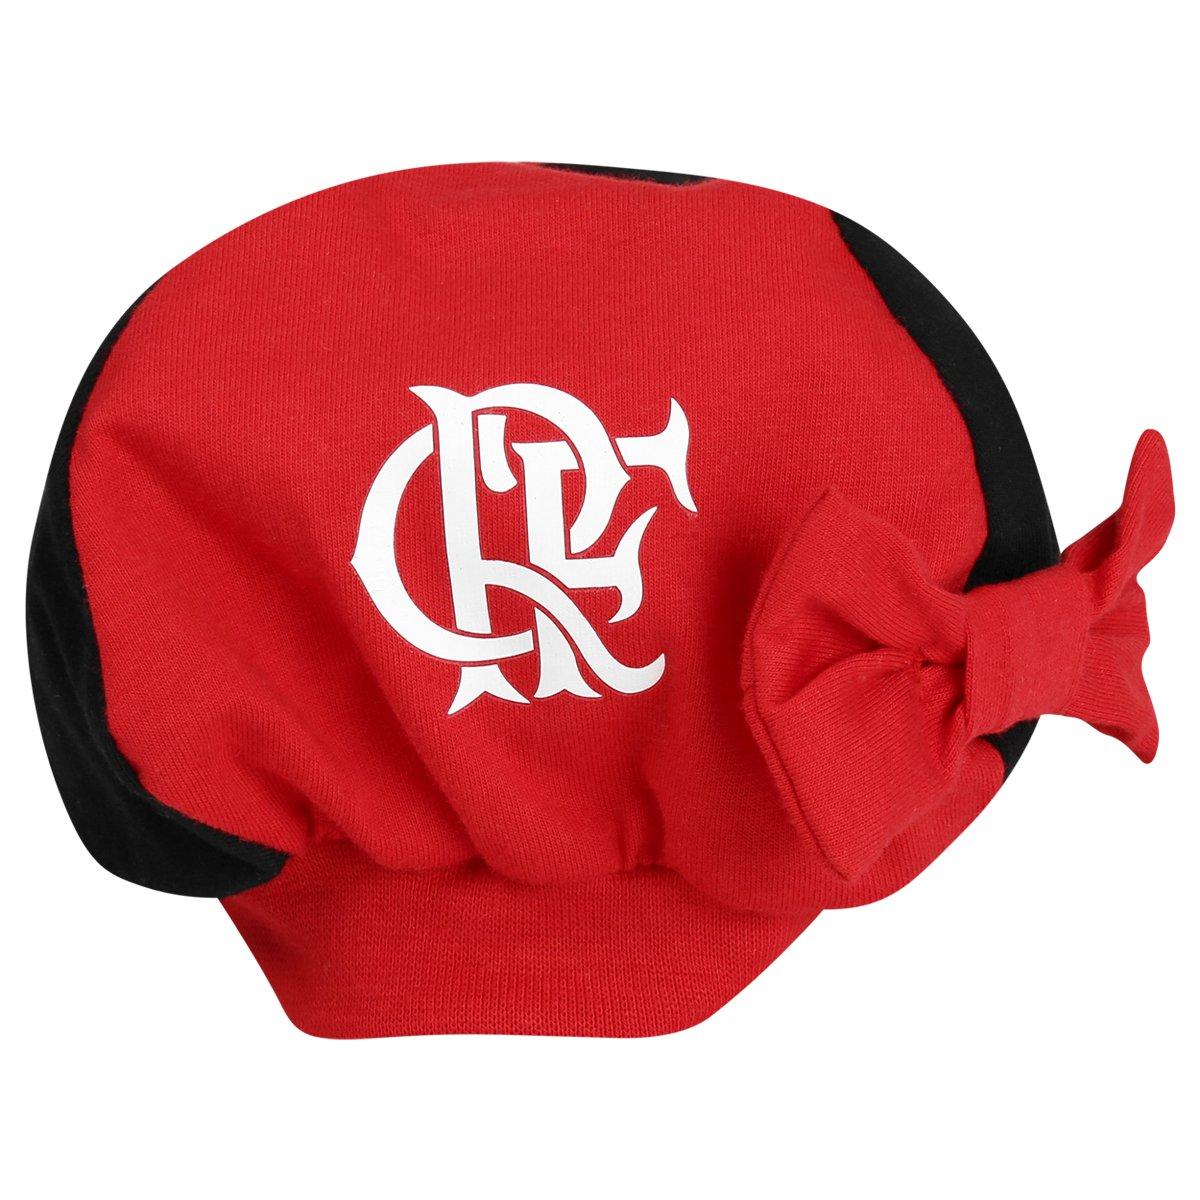 46ed27b806231 Boina Flamengo Infantil Feminina - Compre Agora